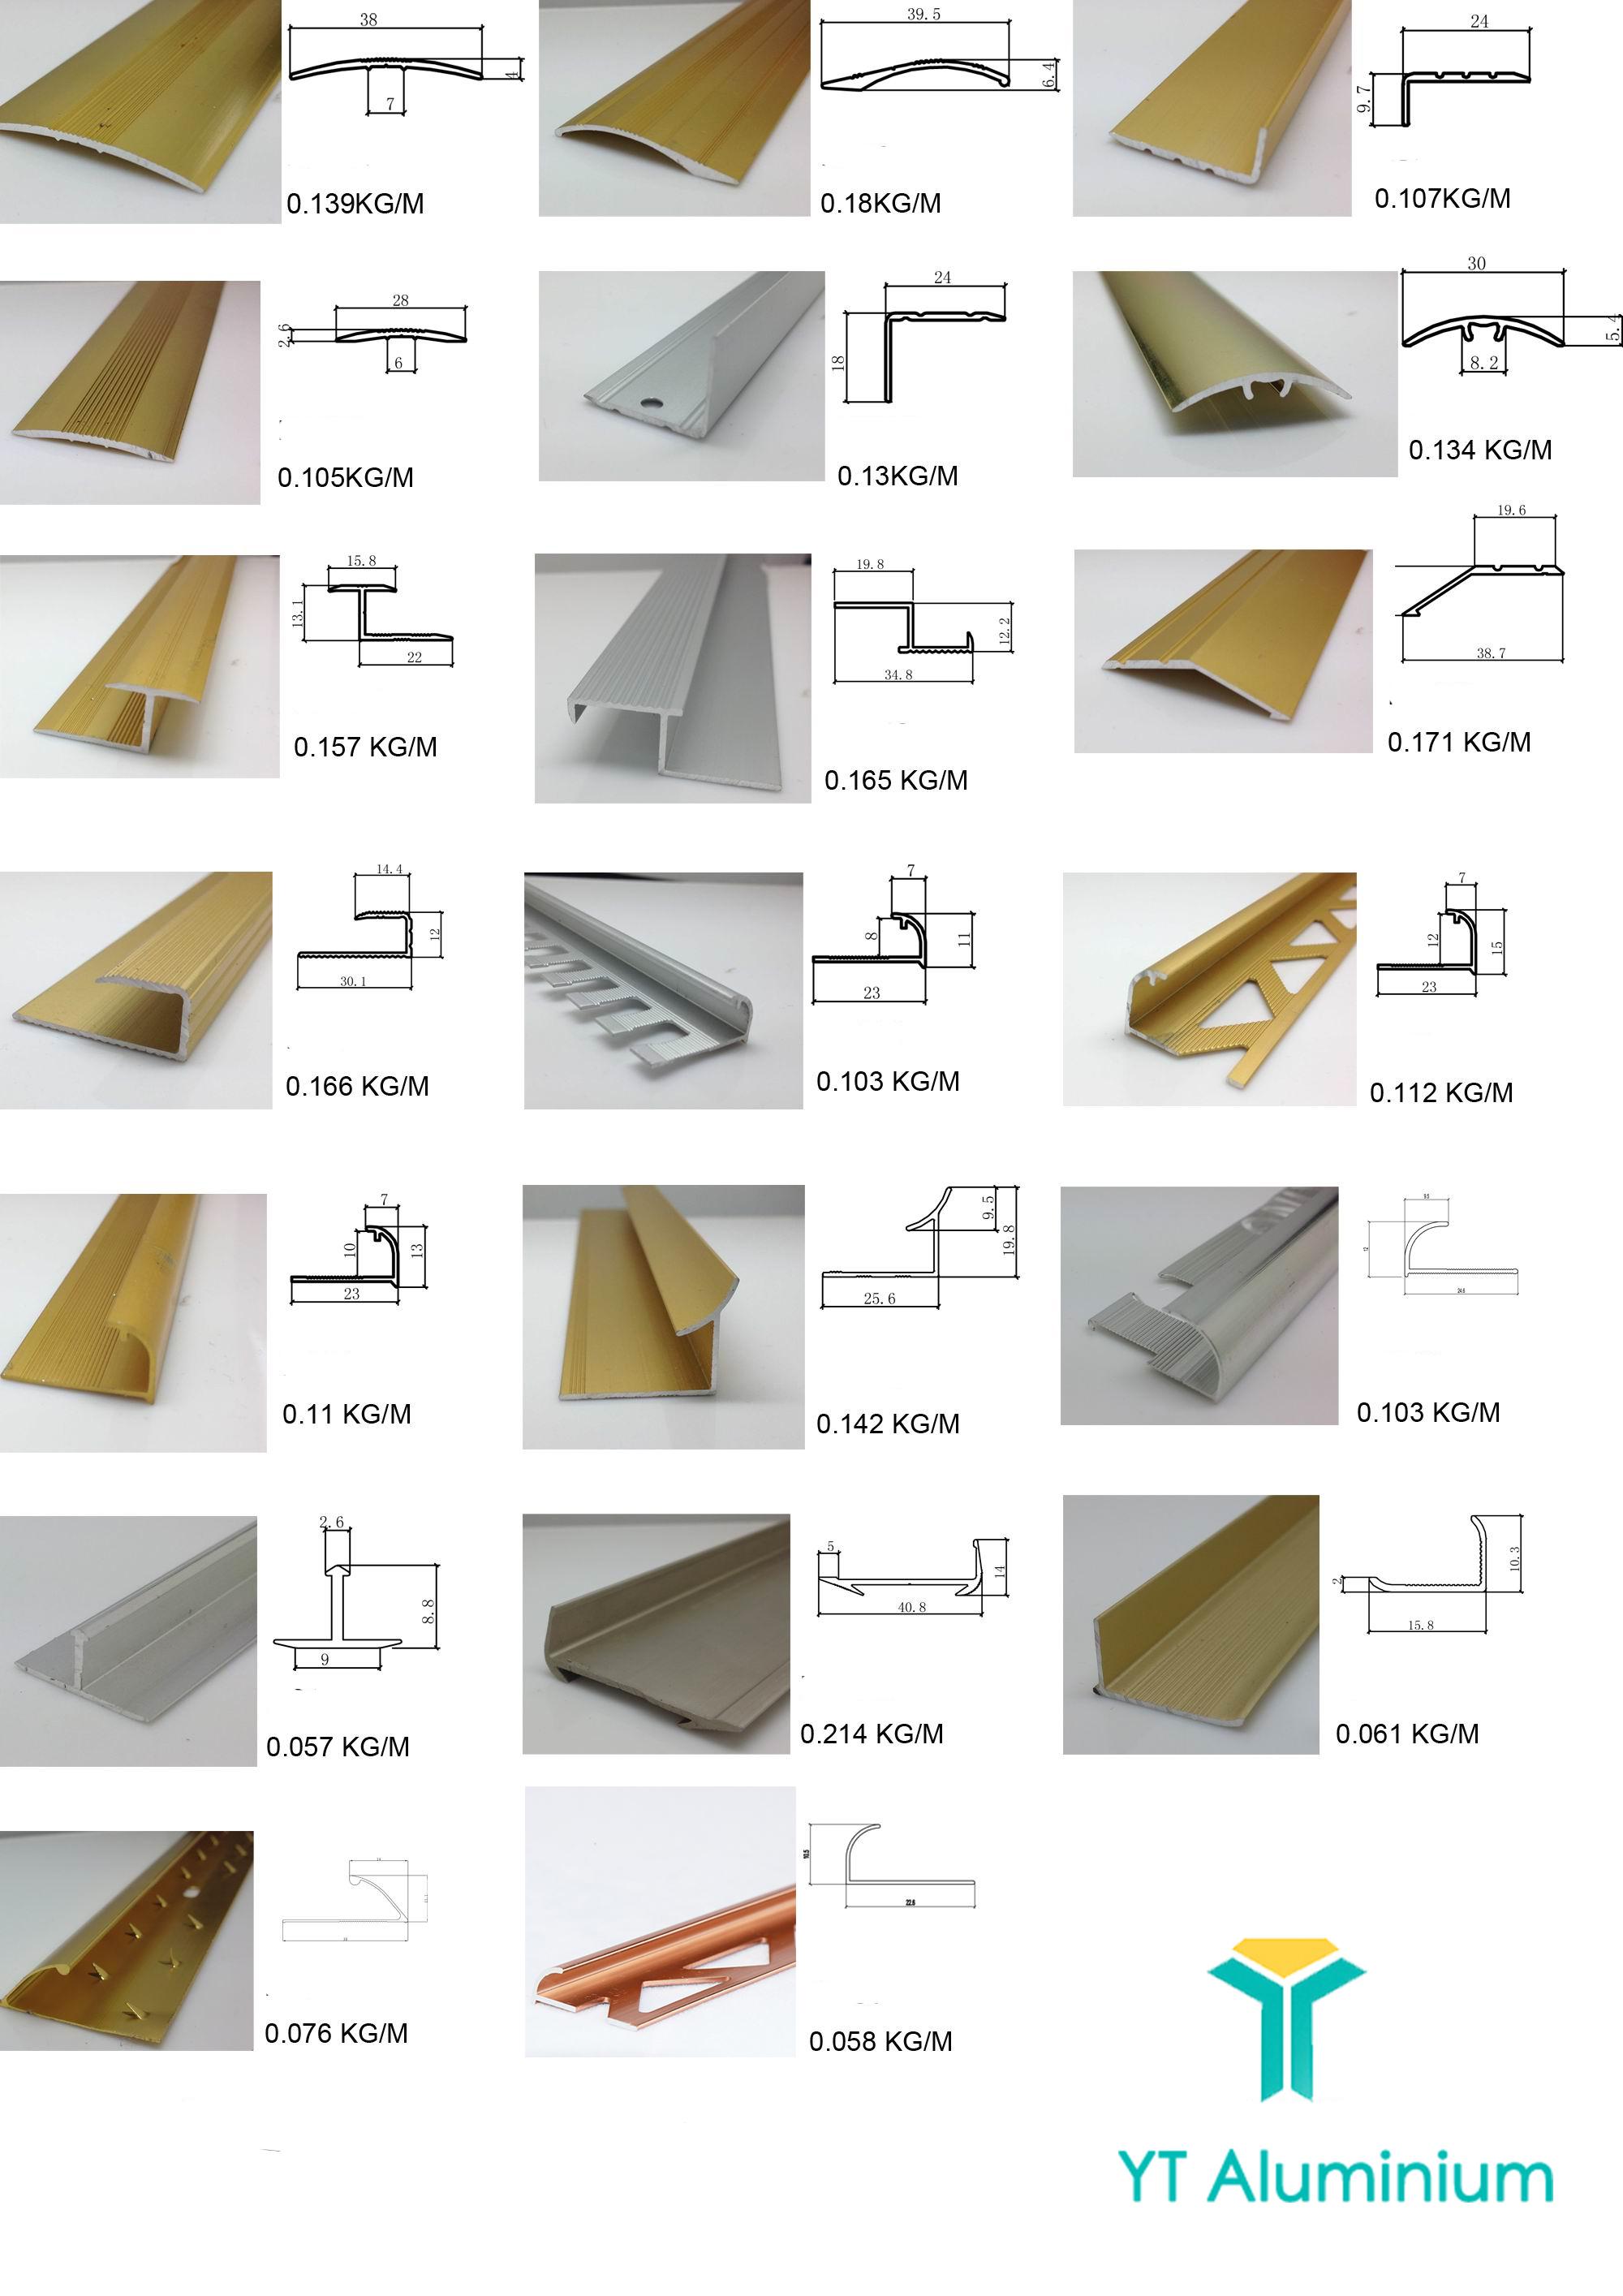 yutian aluminum tile end trim pieces wide tile finishing trim malaysia quadrant corner edge wall tile trim profile view tile edge trim yutian